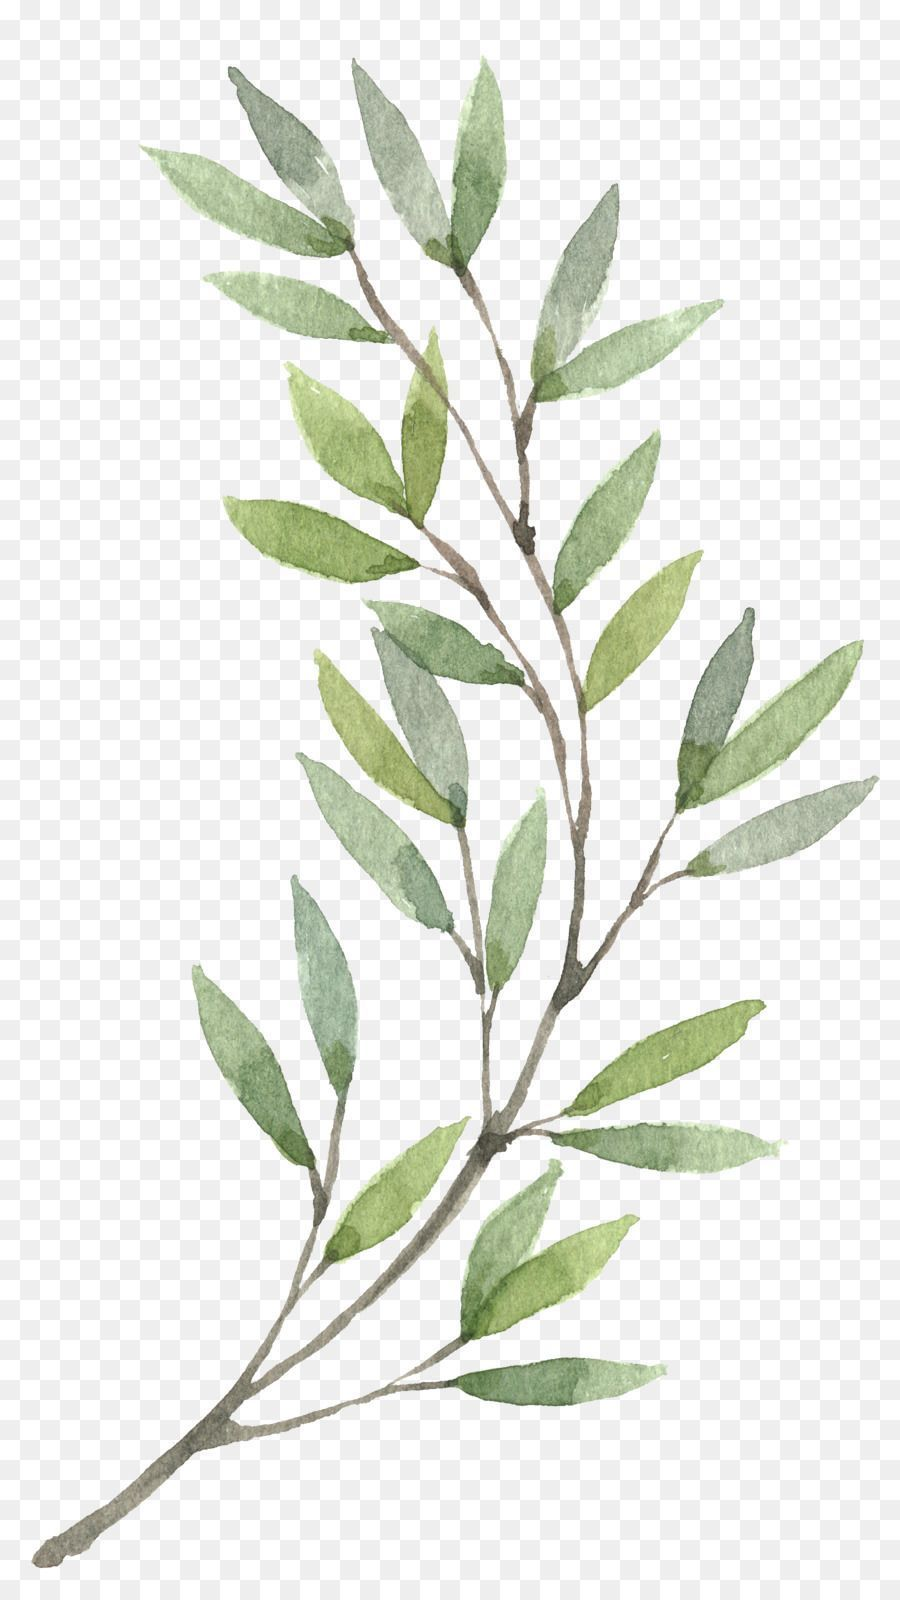 Handpainted Watercolor Painting Wreath Flower Plants Clip Artwreath Watercolor Painting Flower Clip Ar Wie Man Blumen Malt Pflanzenmalerei Illustration